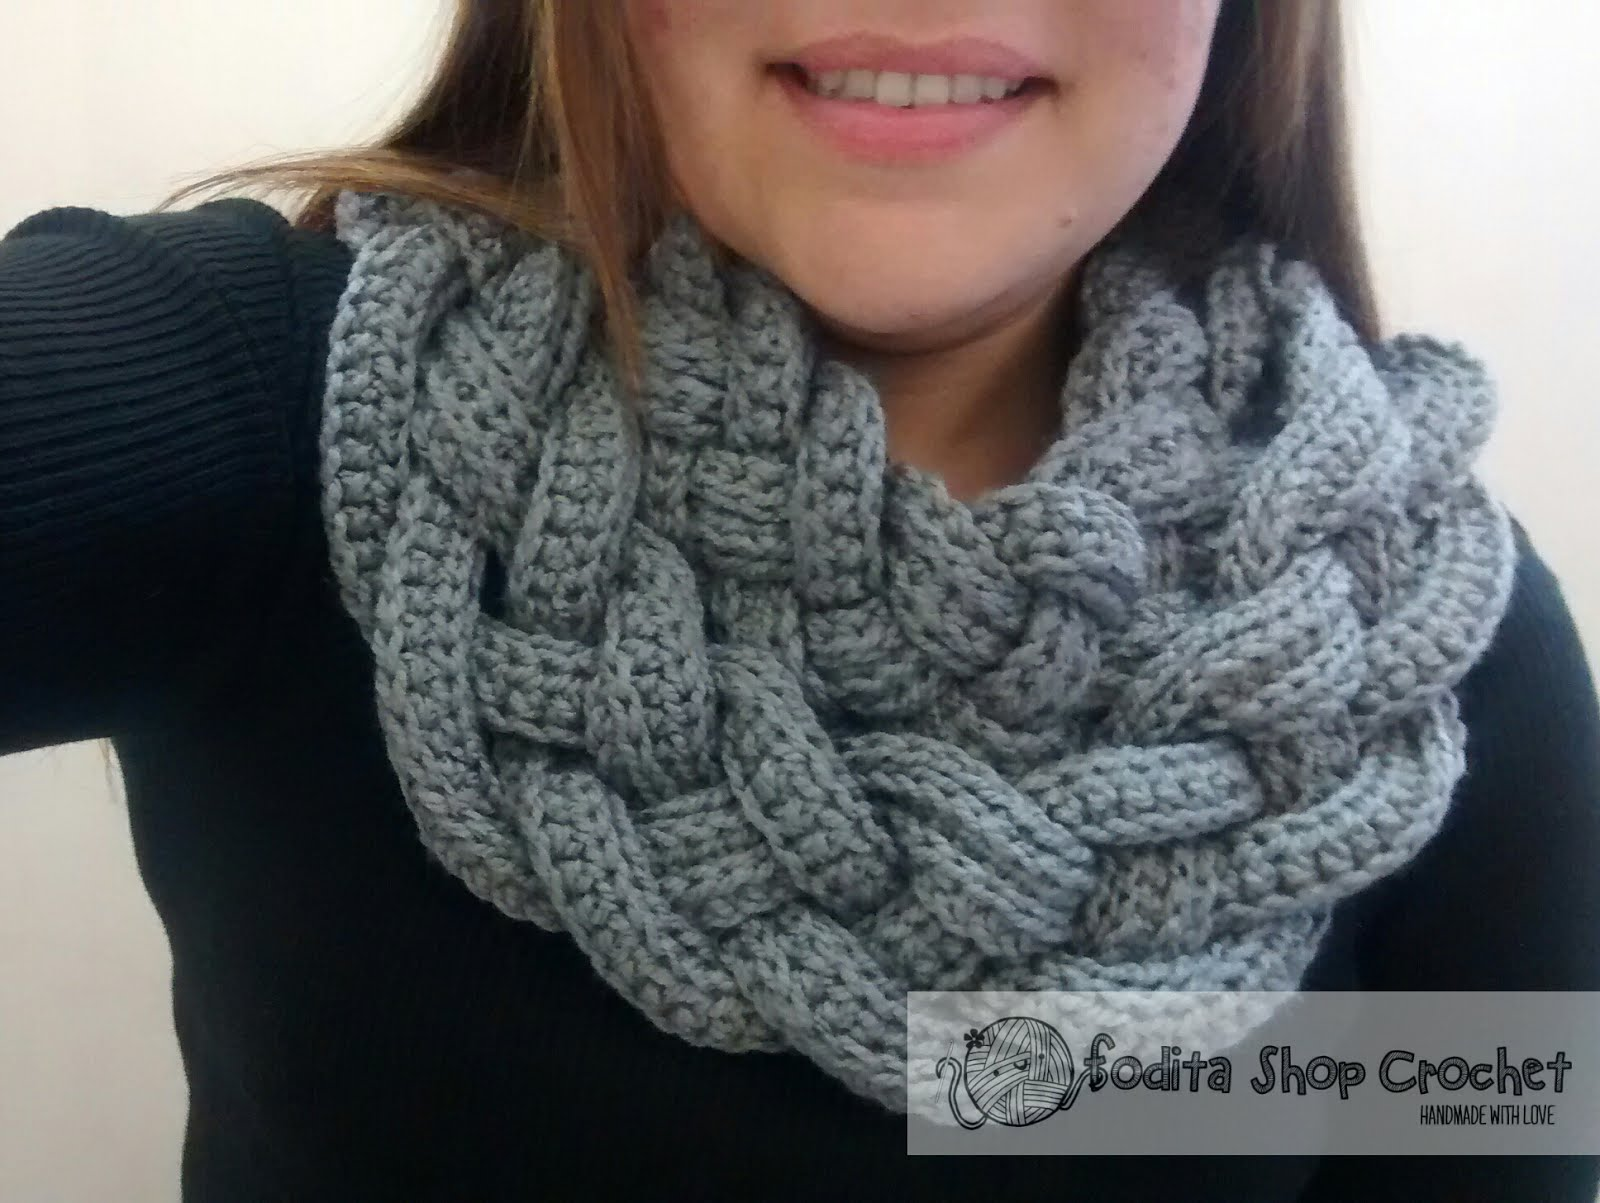 Bufanda trenzada   Fodita Shop Crochet